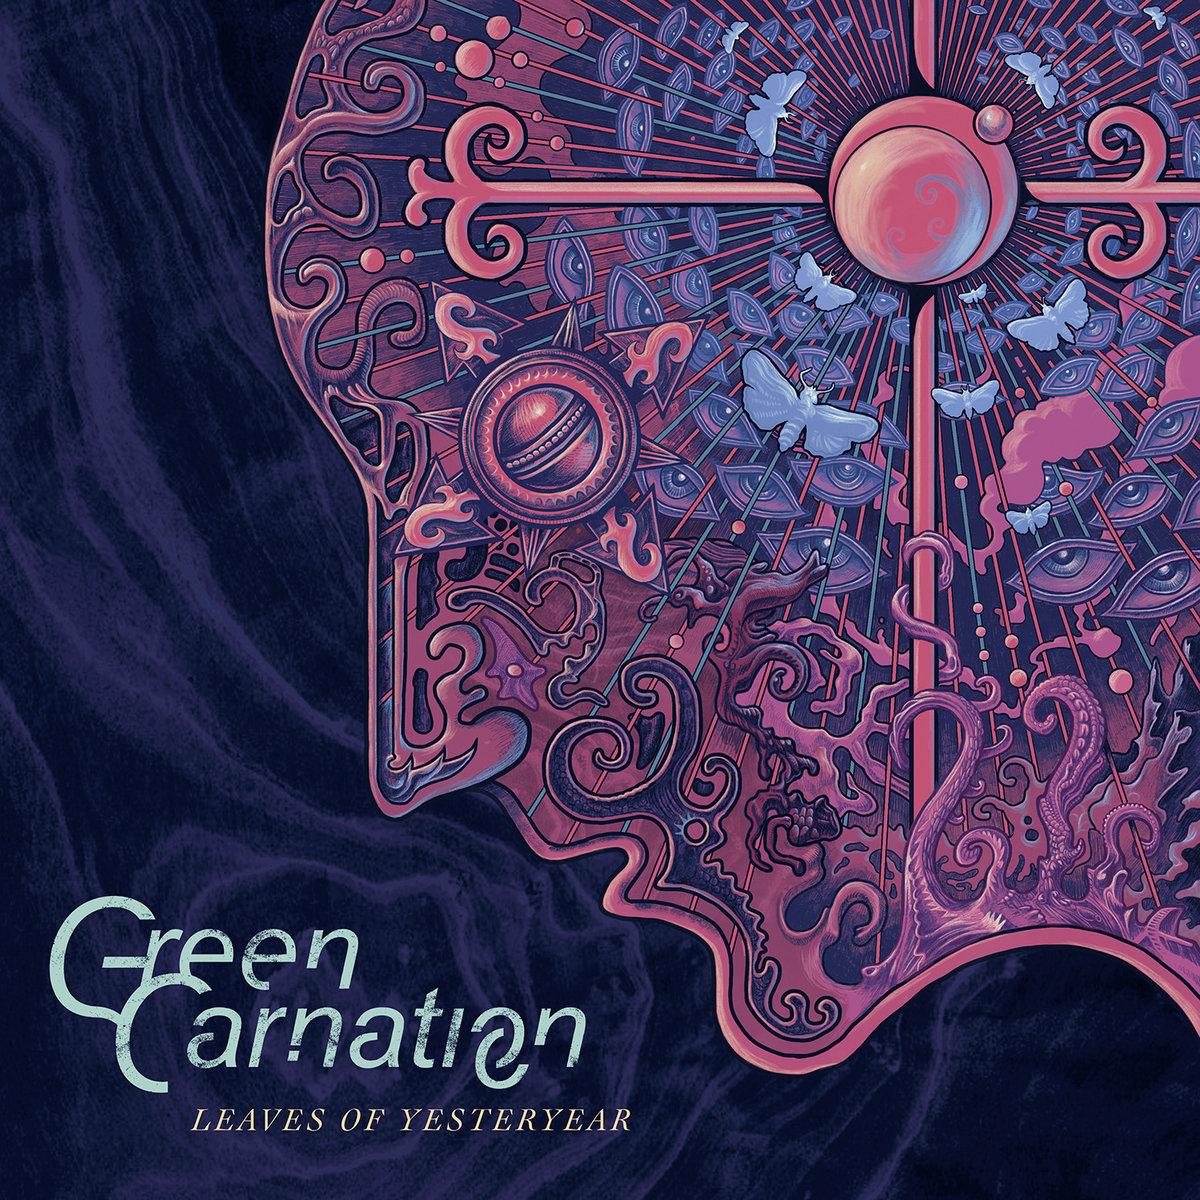 Leaves of Yesteryear | Green Carnation